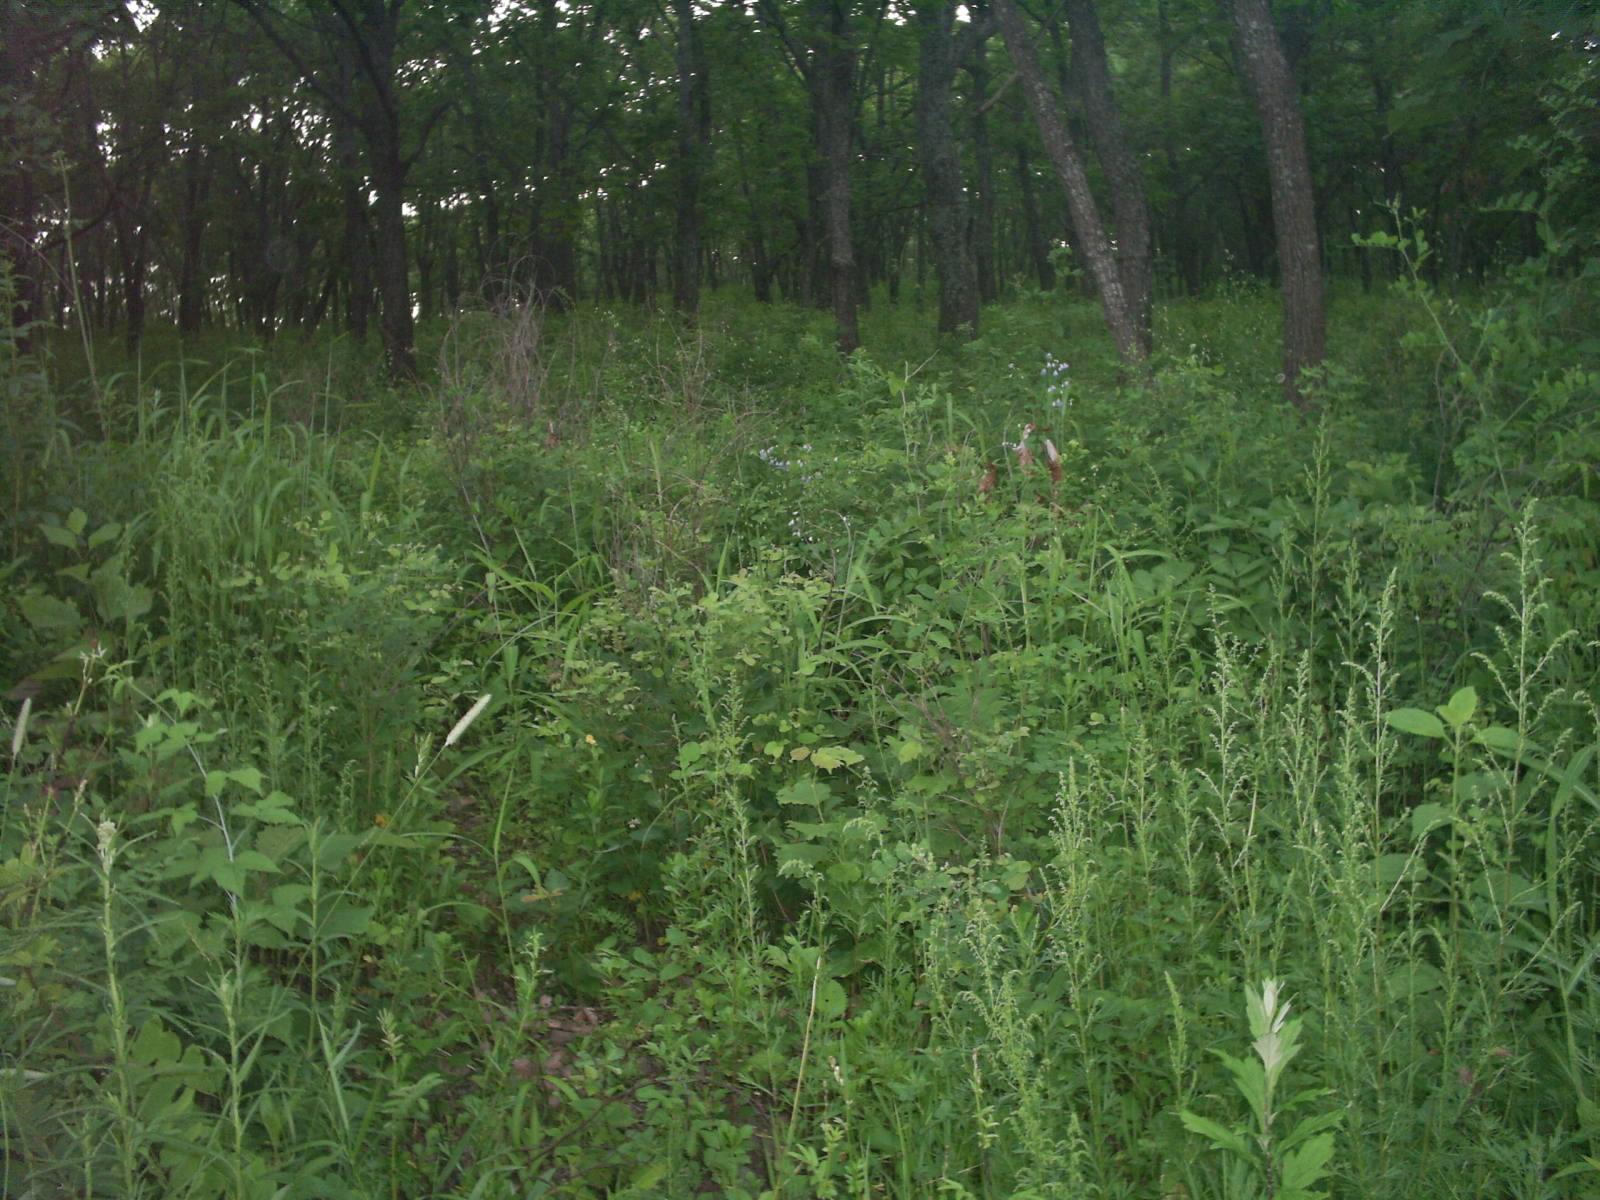 Файл:Forest Grass Primorsky Krai.jpg